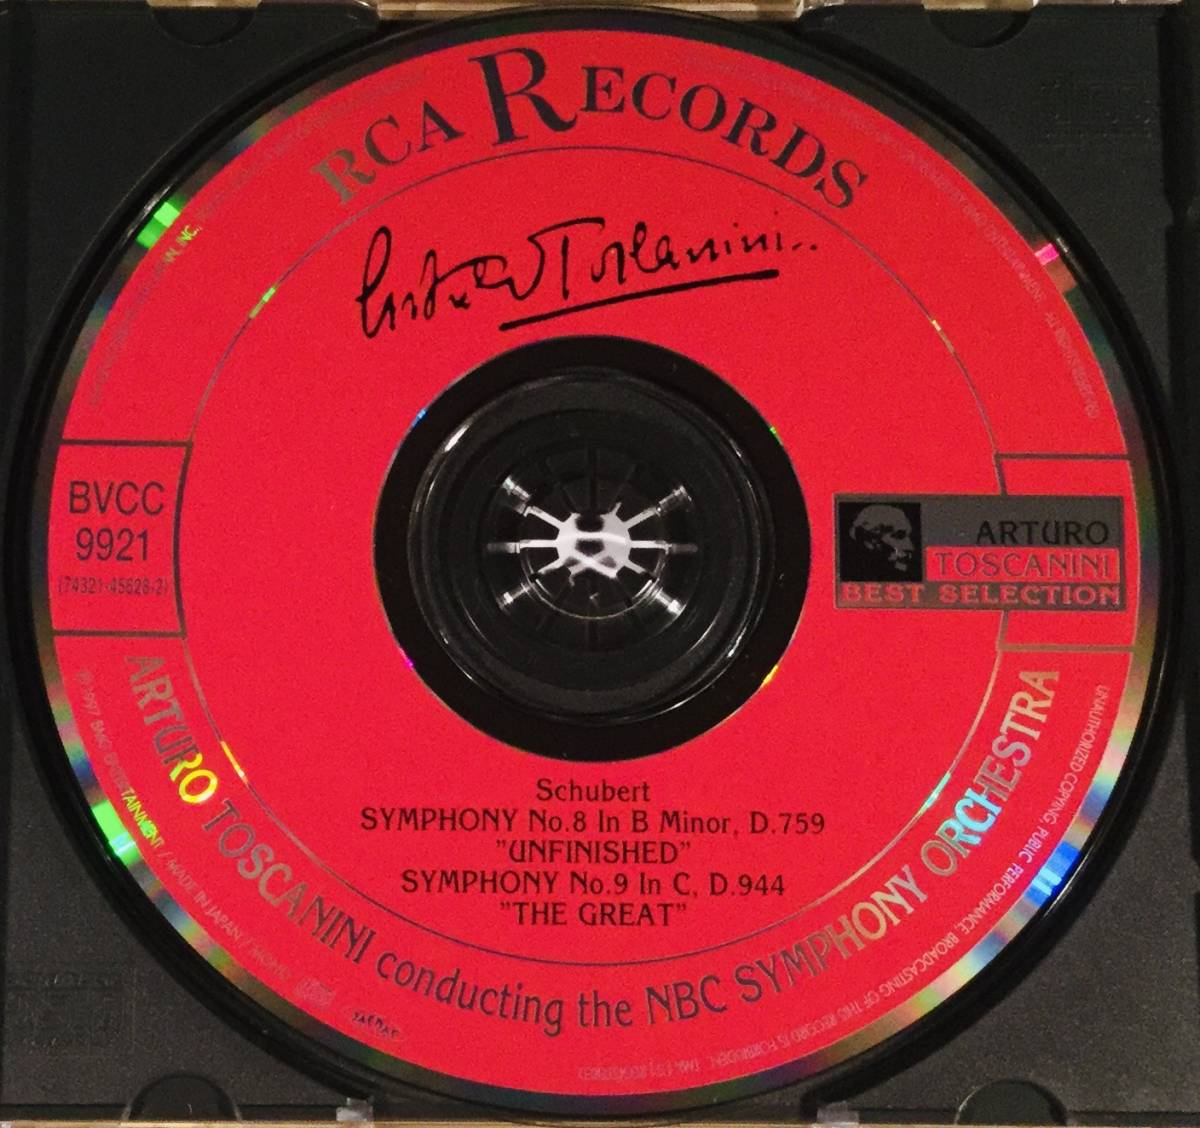 CD(完全限定盤)▲シューベルト:交響曲 第8番『未完成』&第9番『ザ・グレイト』◎アルトゥール・トスカニーニ指揮▲帯付美品!_画像4